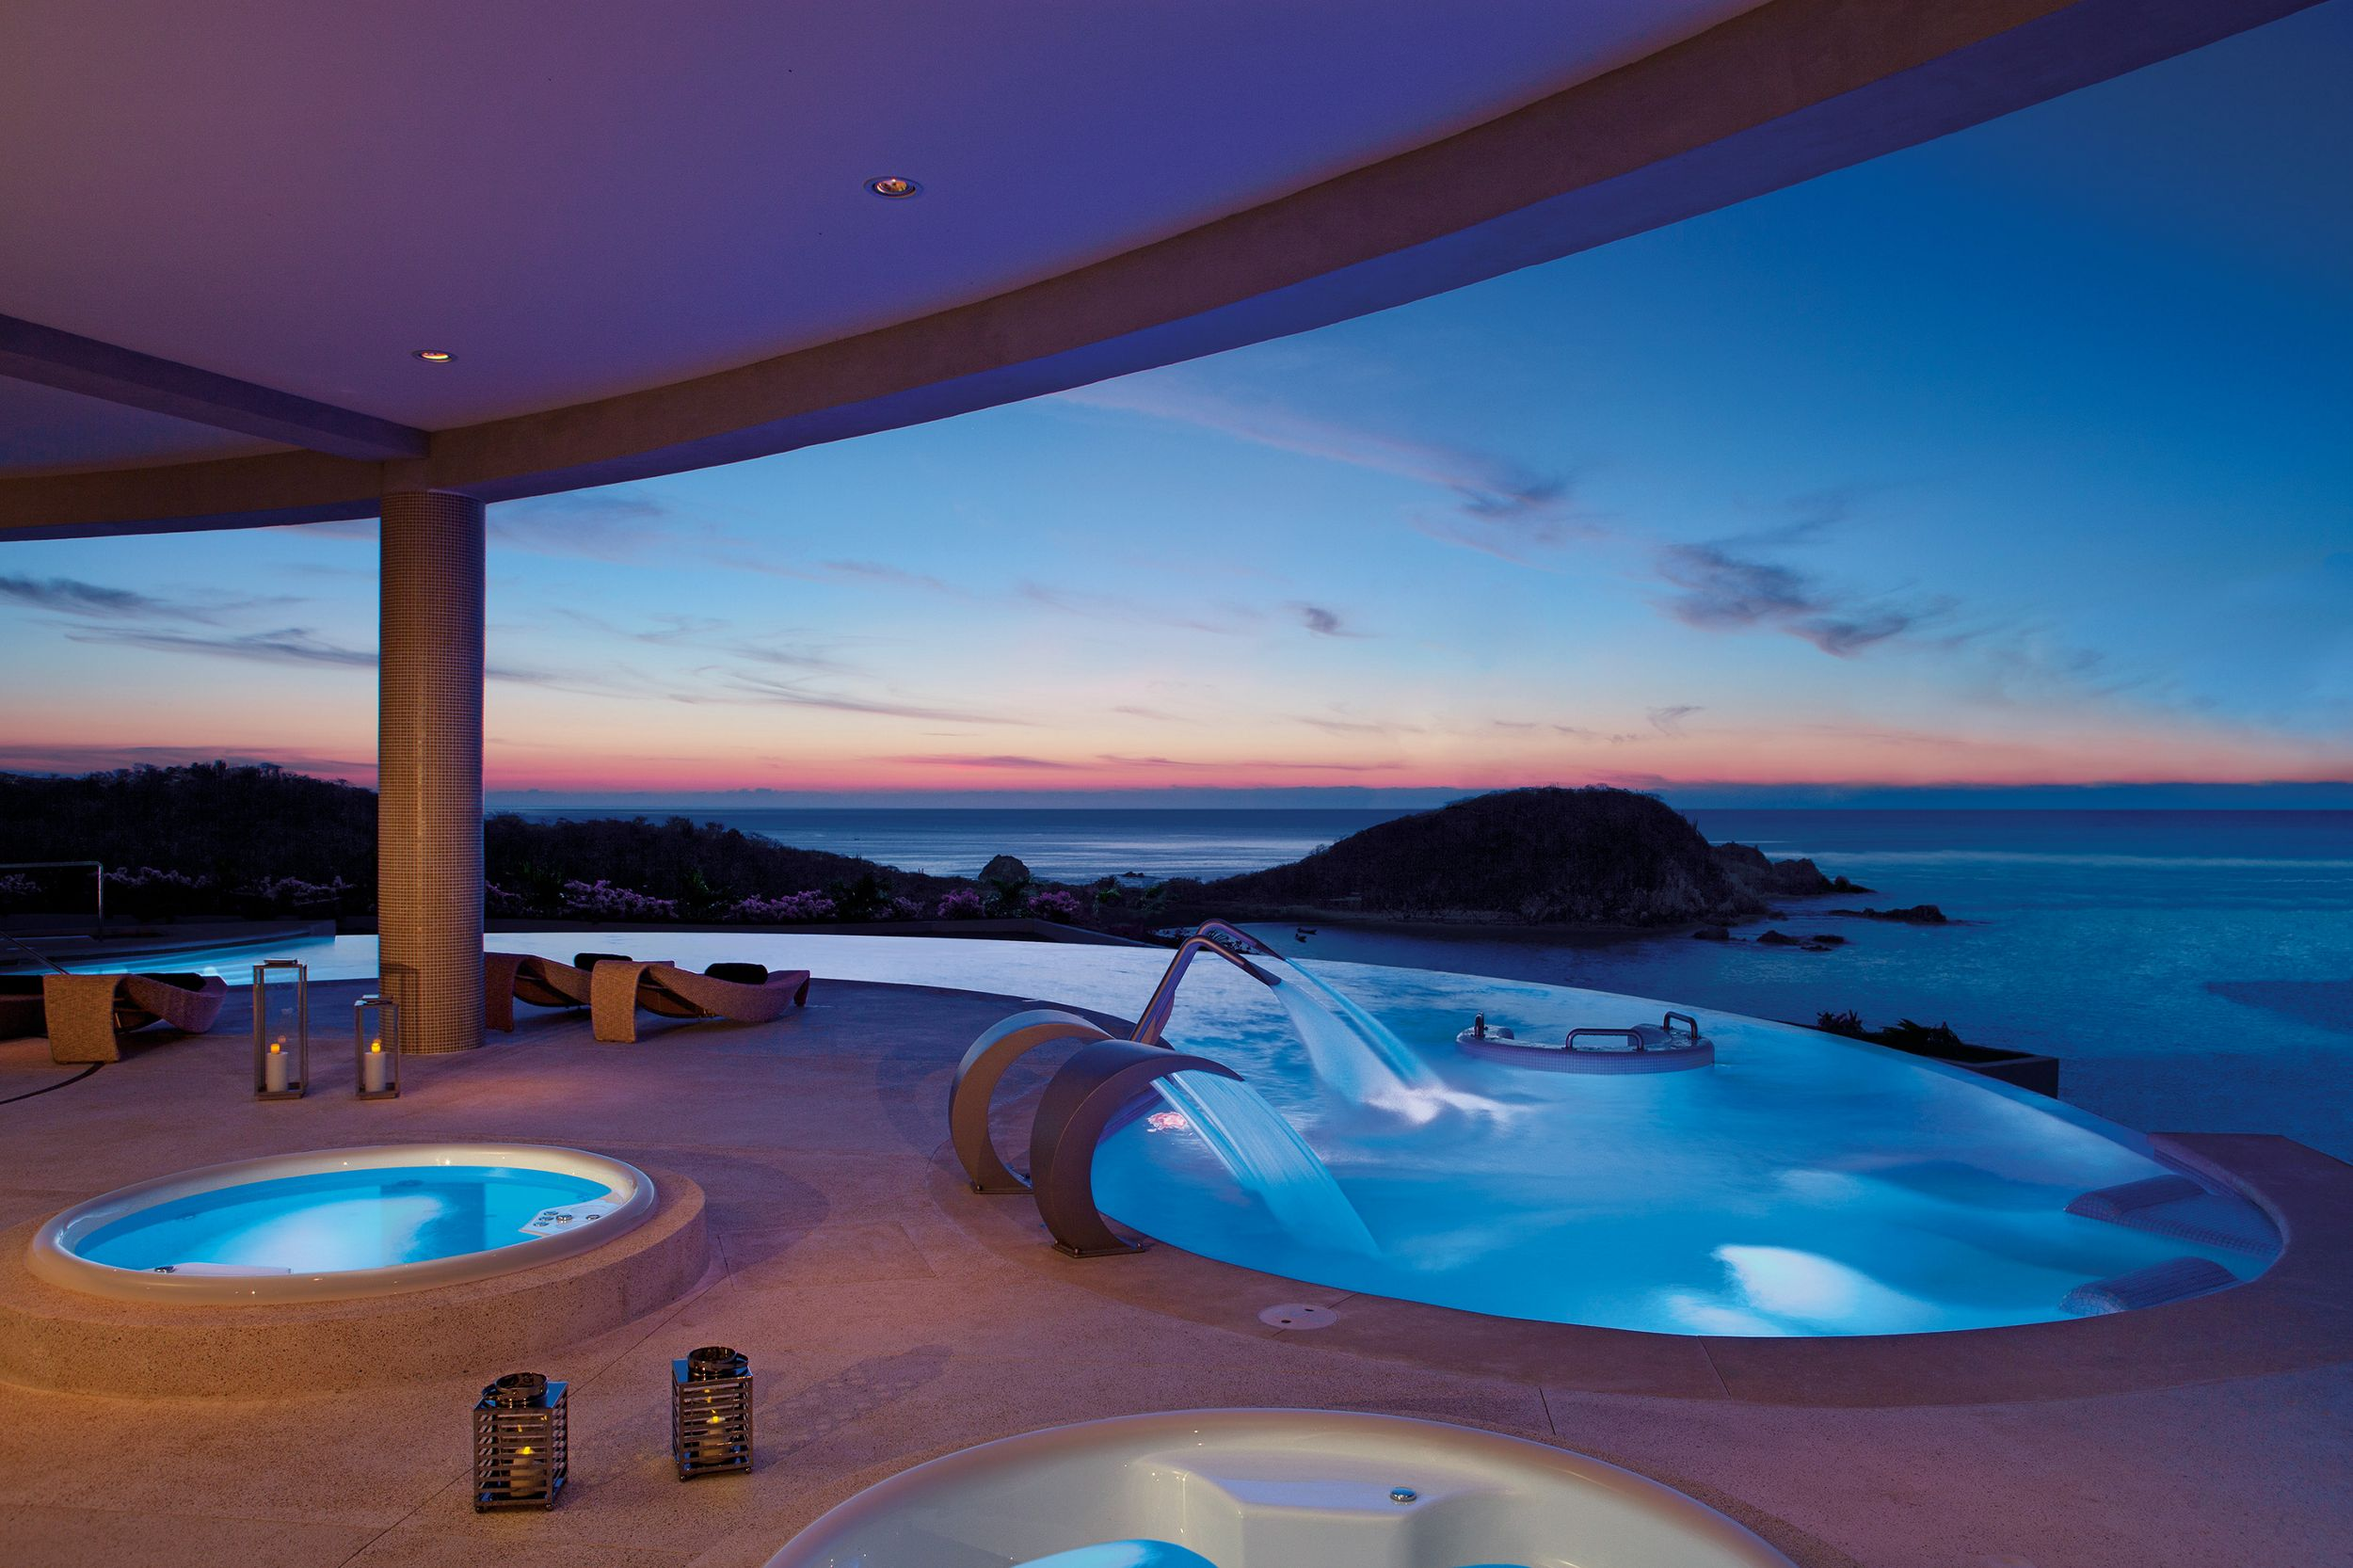 hoteles-con-encanto-en-Mexico-Secrets